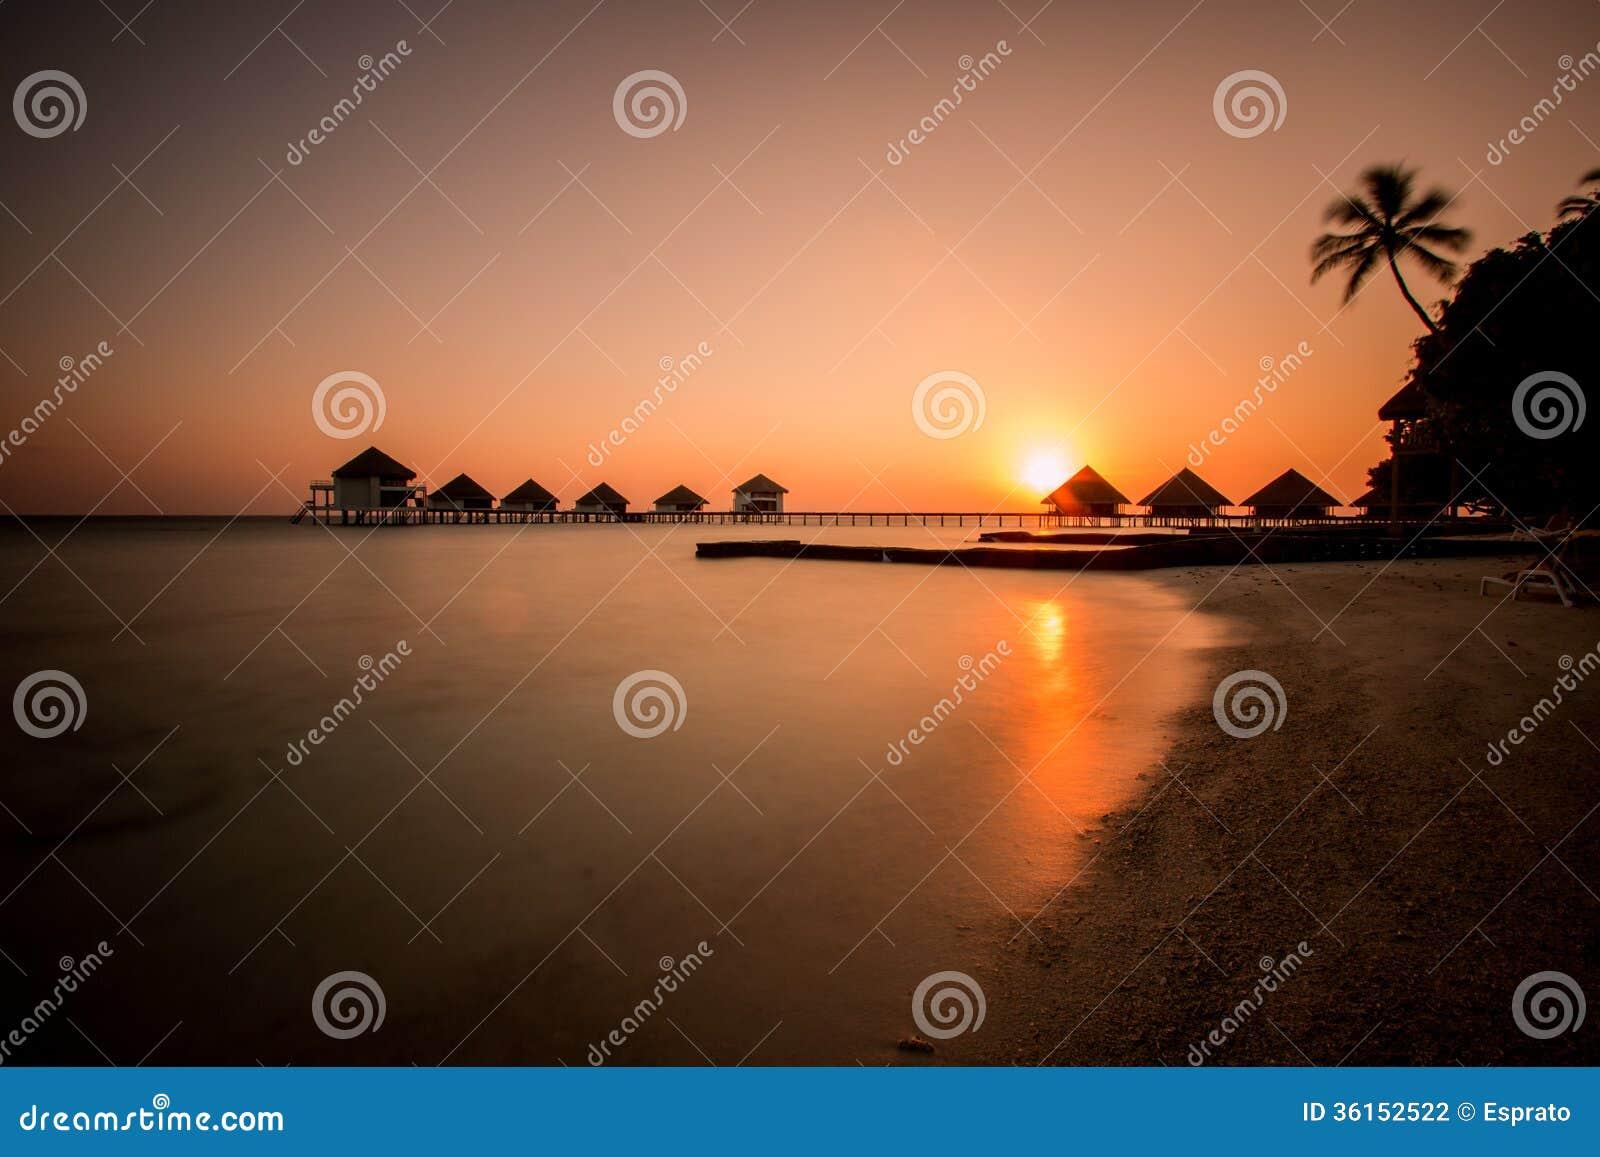 Best Hotels in Maldives | Adaaran Club Rannalhi Maldives - Holiday and ...